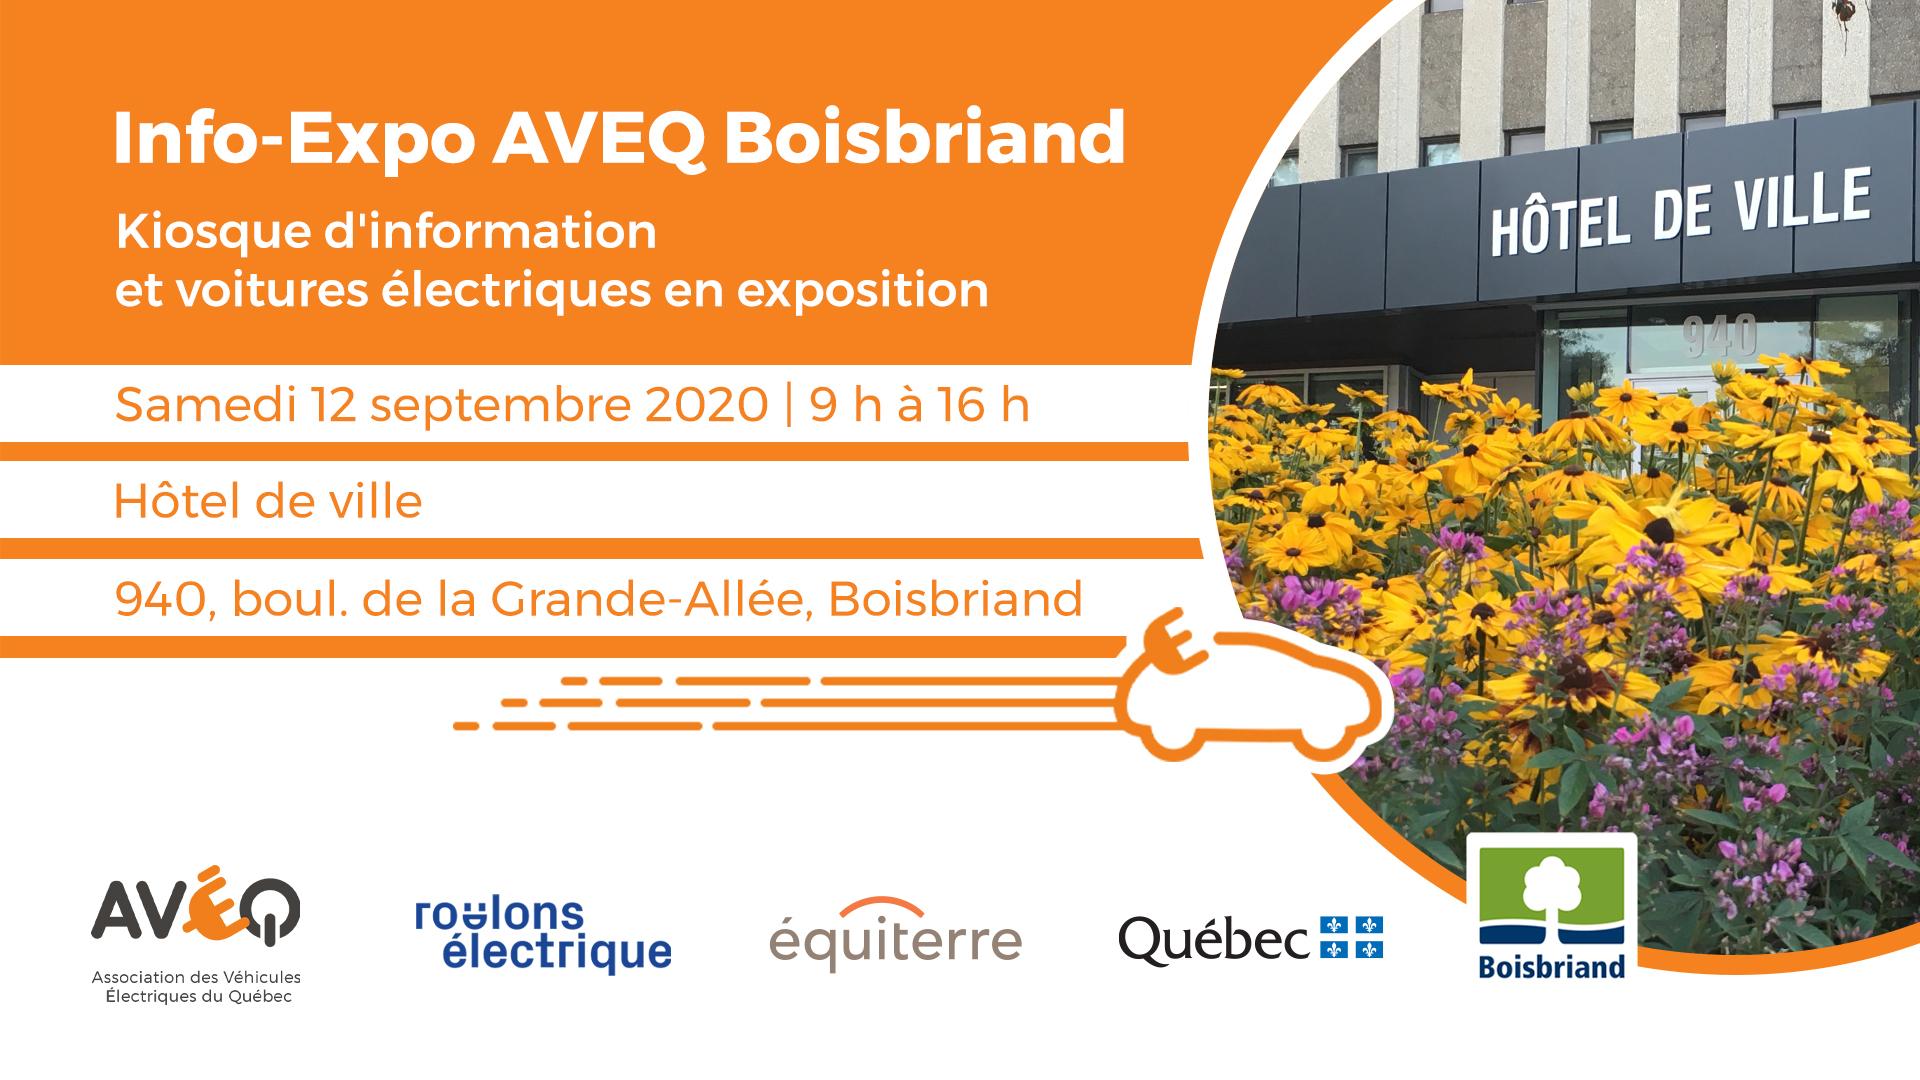 Info-Expo AVEQ Boisbriand